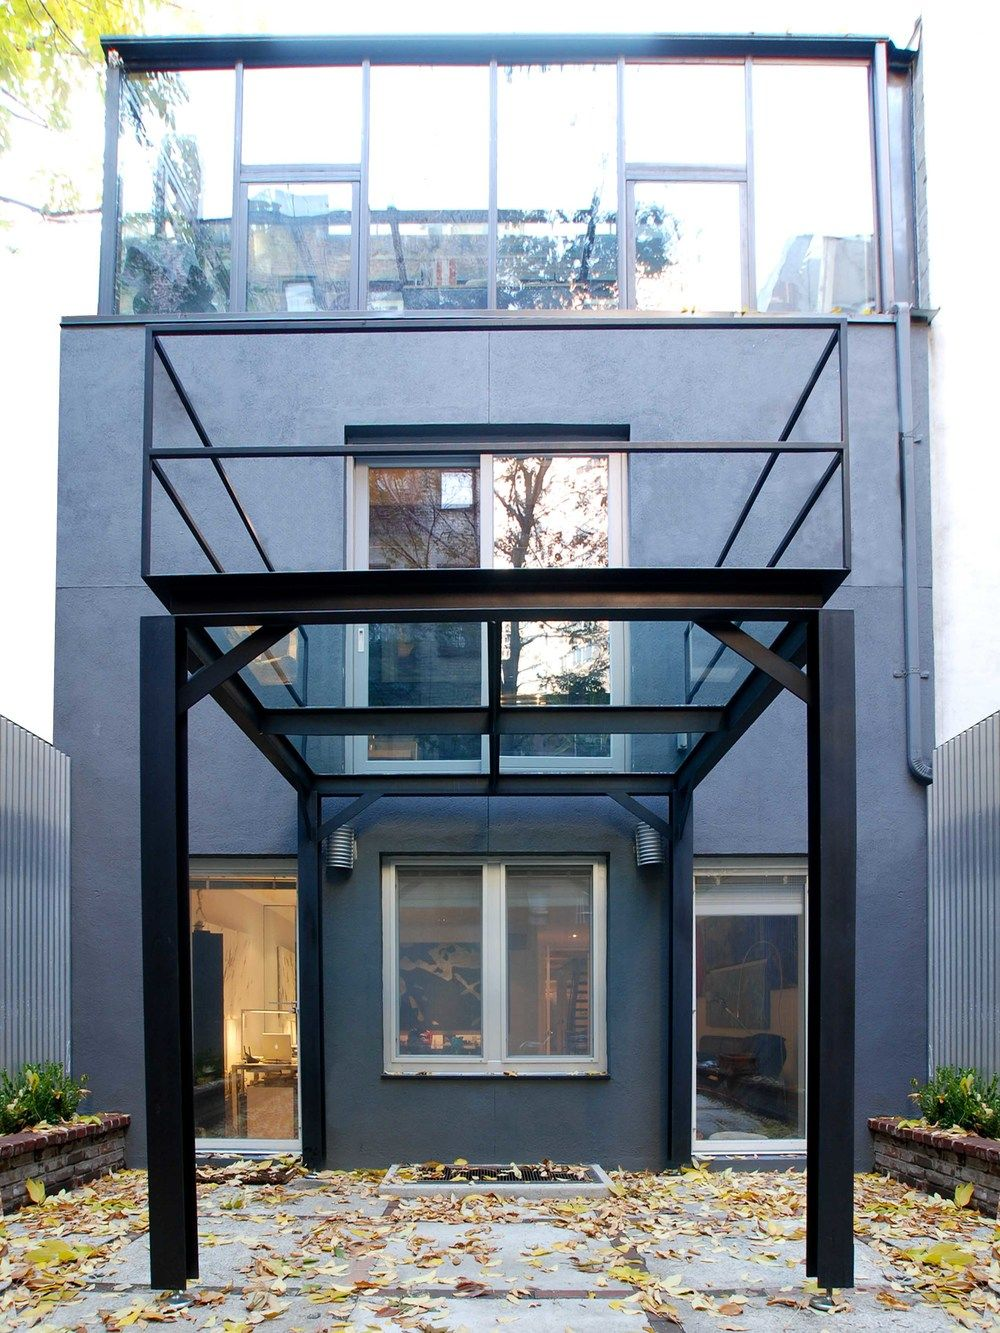 Blackened steel Ibeams and structural steel harmonize